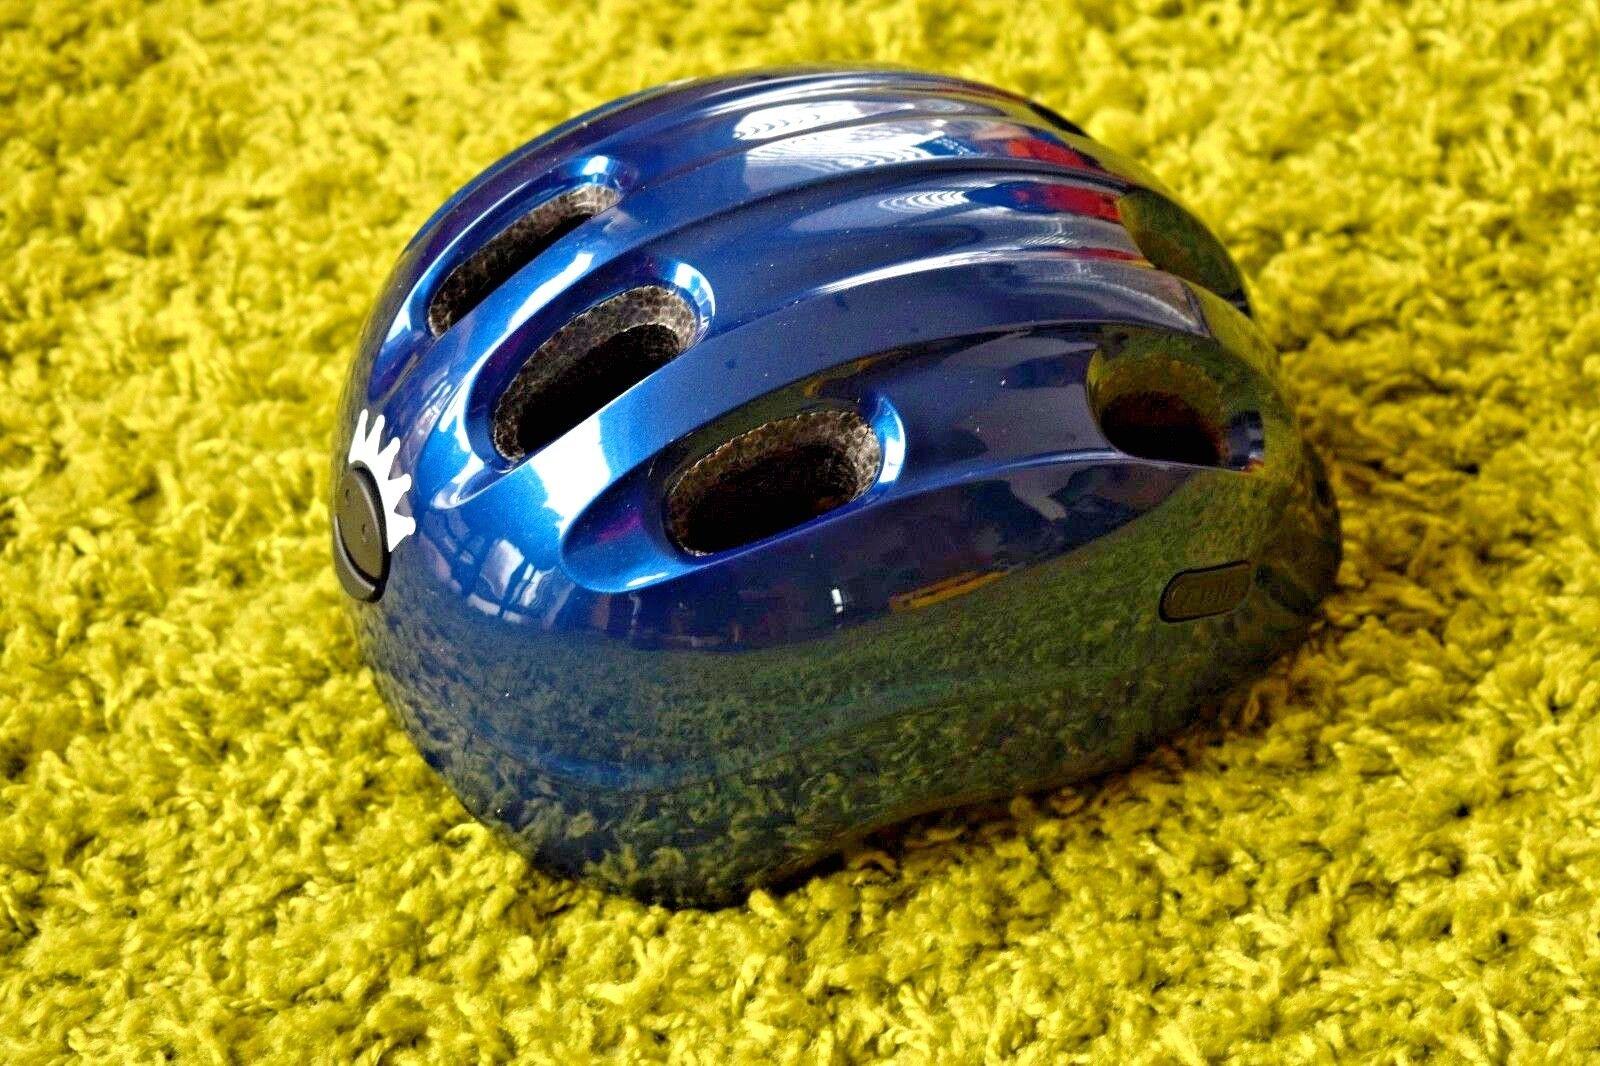 Fahrradhelm Kinder - Abus Abus Abus Smiley 2.0 - royal Blau - Gr M (50-55cm) - NEU 6f767a